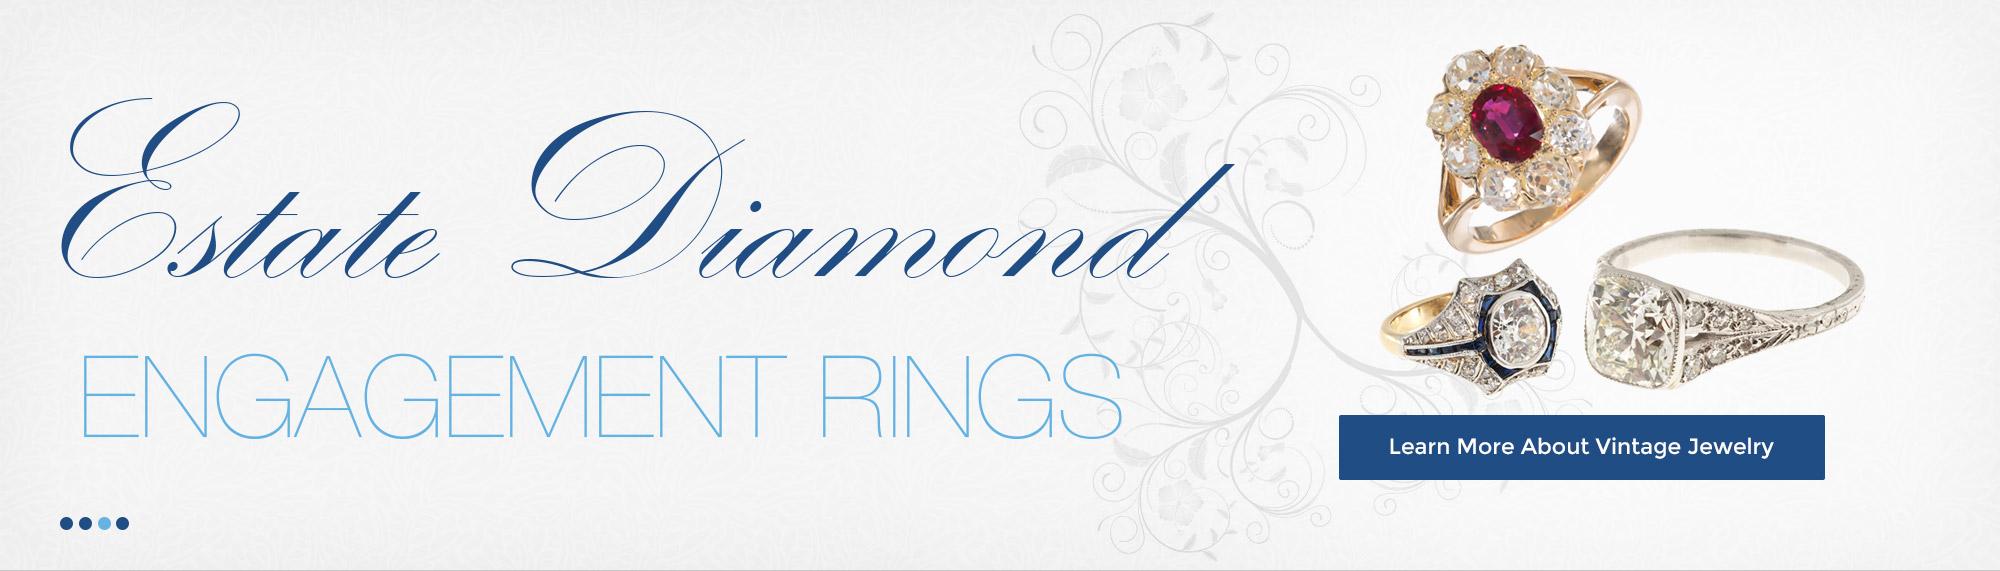 Estate Diamond Engagement Rings